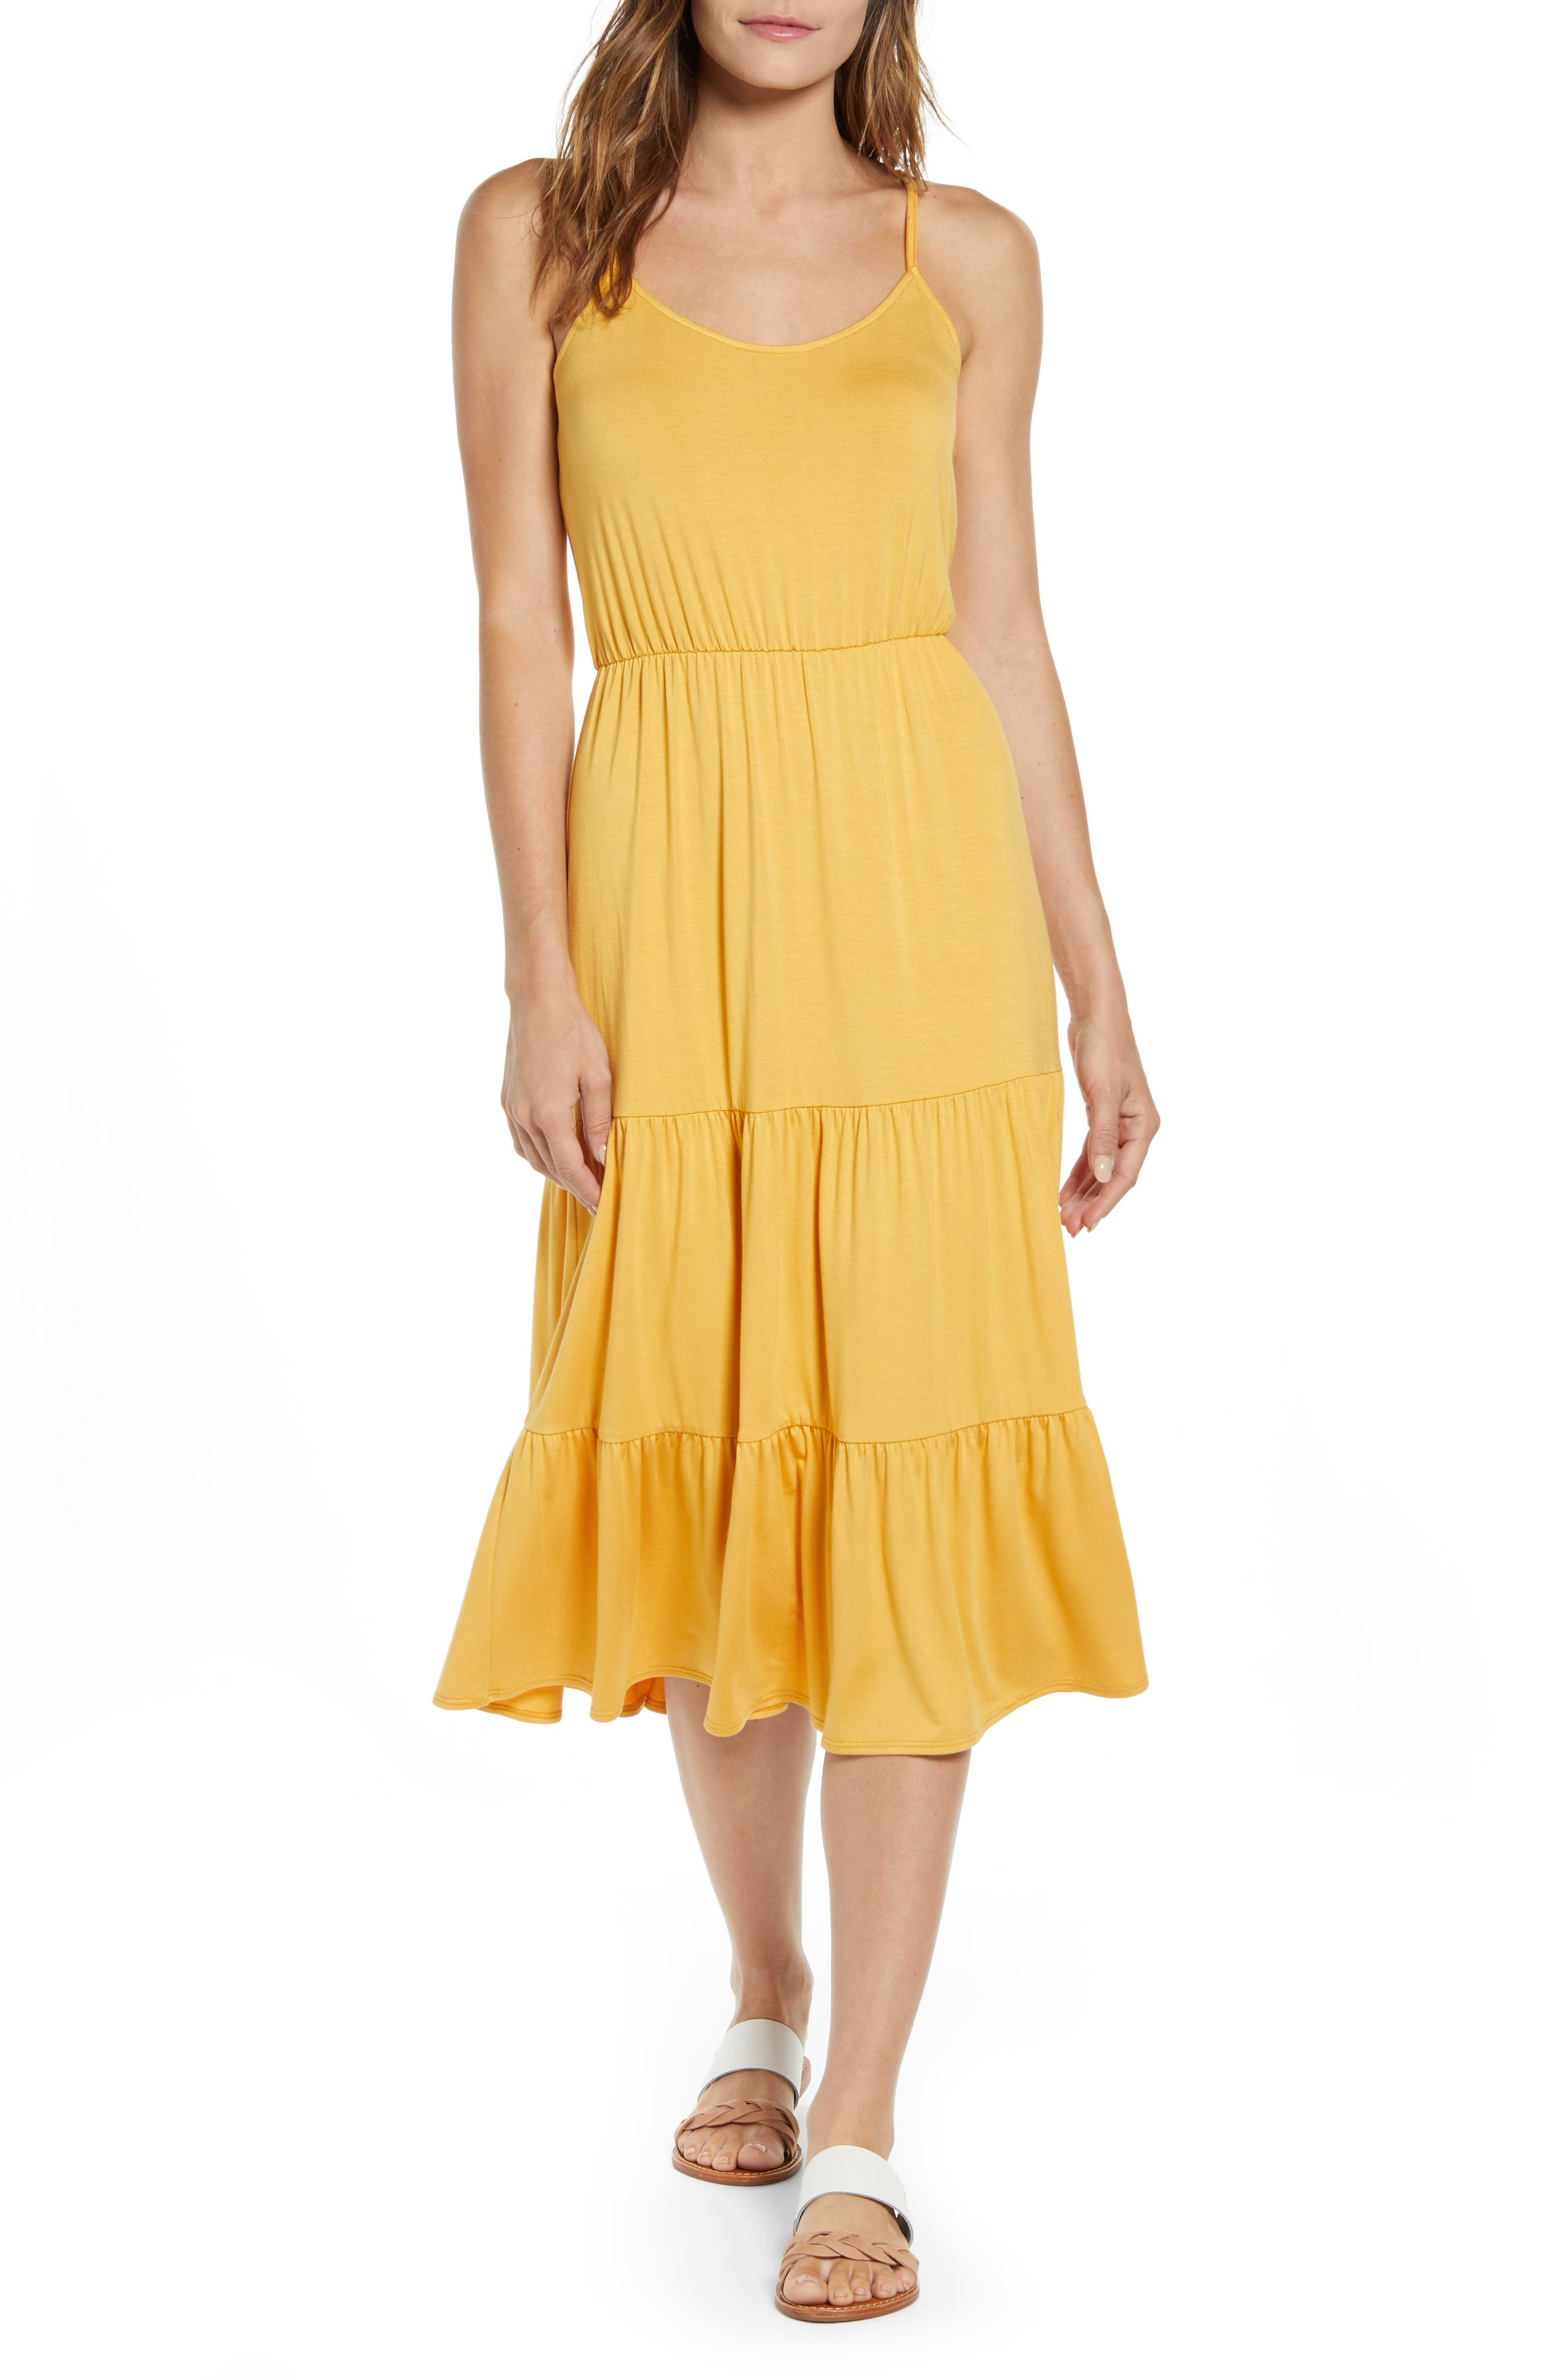 Petite Gibson X The Motherchic Sunset Tiered Knit Maxi Dress, Yellow